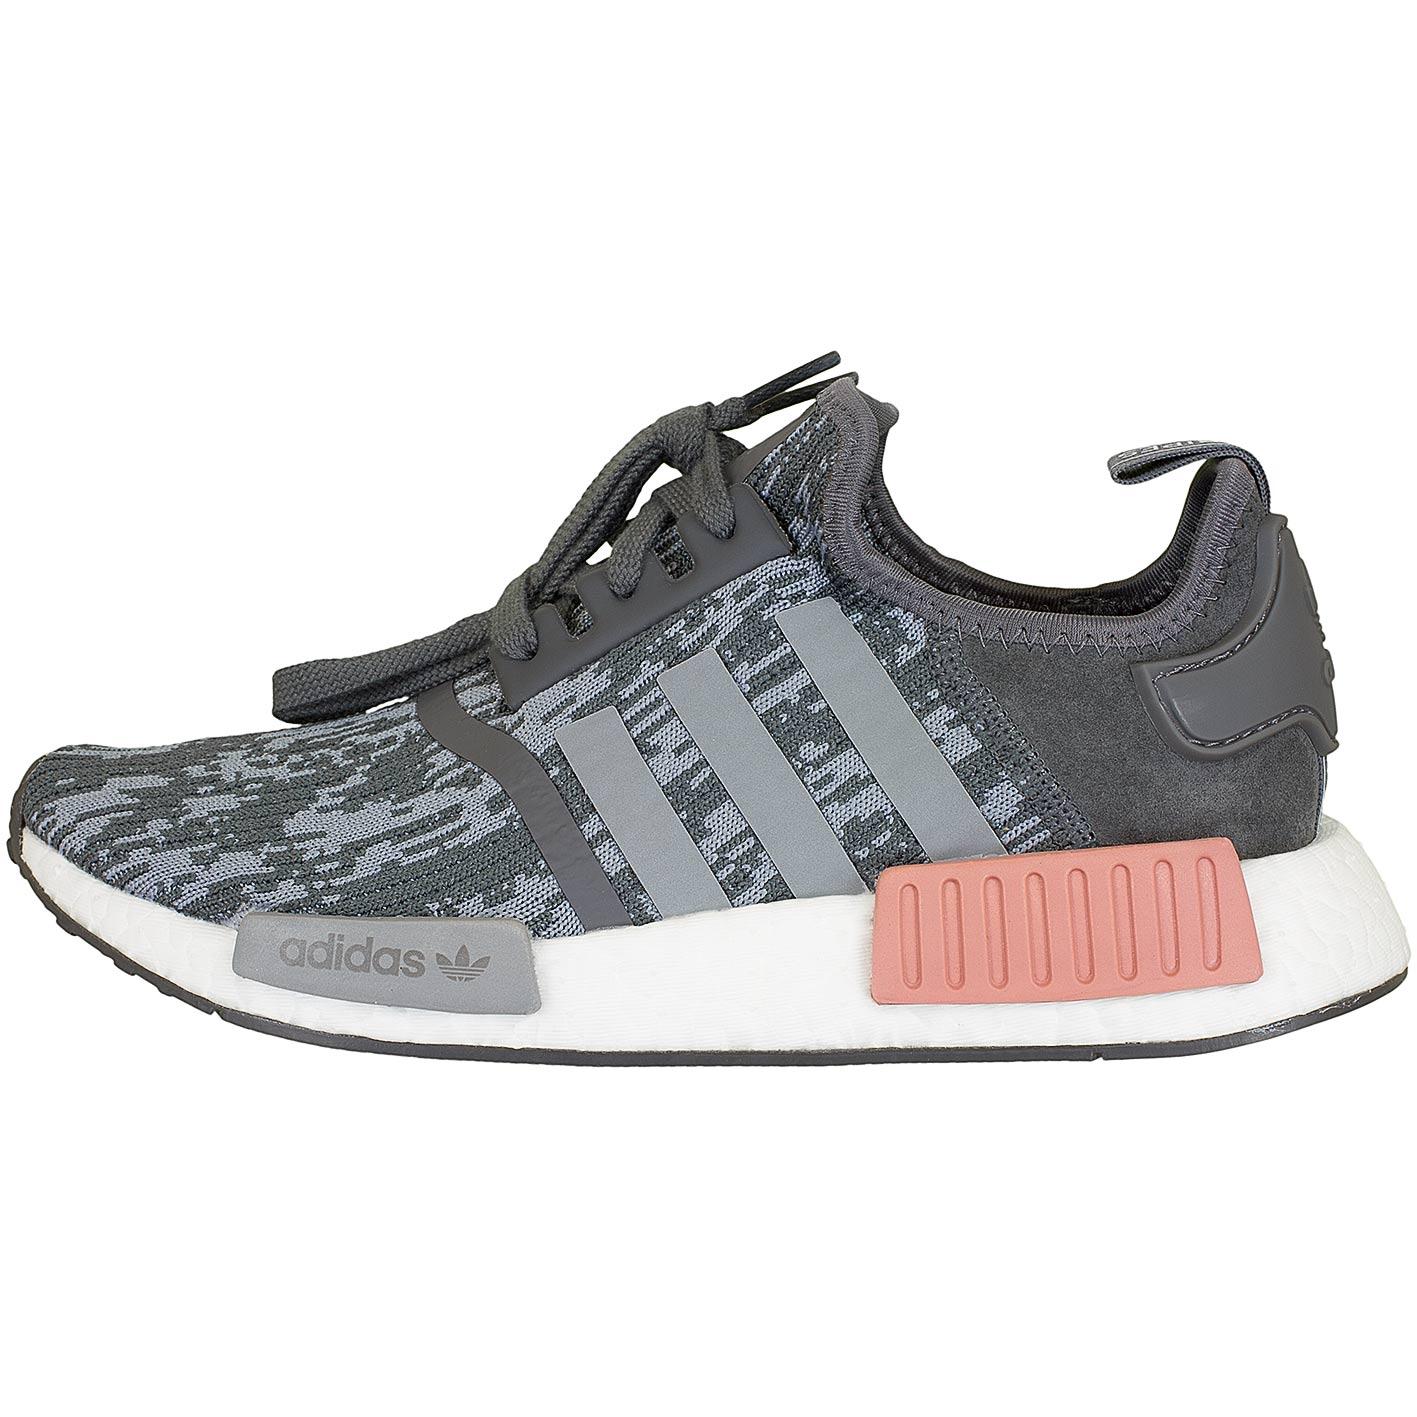 ☆ Adidas Originals Damen Sneaker NMD R1 grau/pink - hier bestellen!